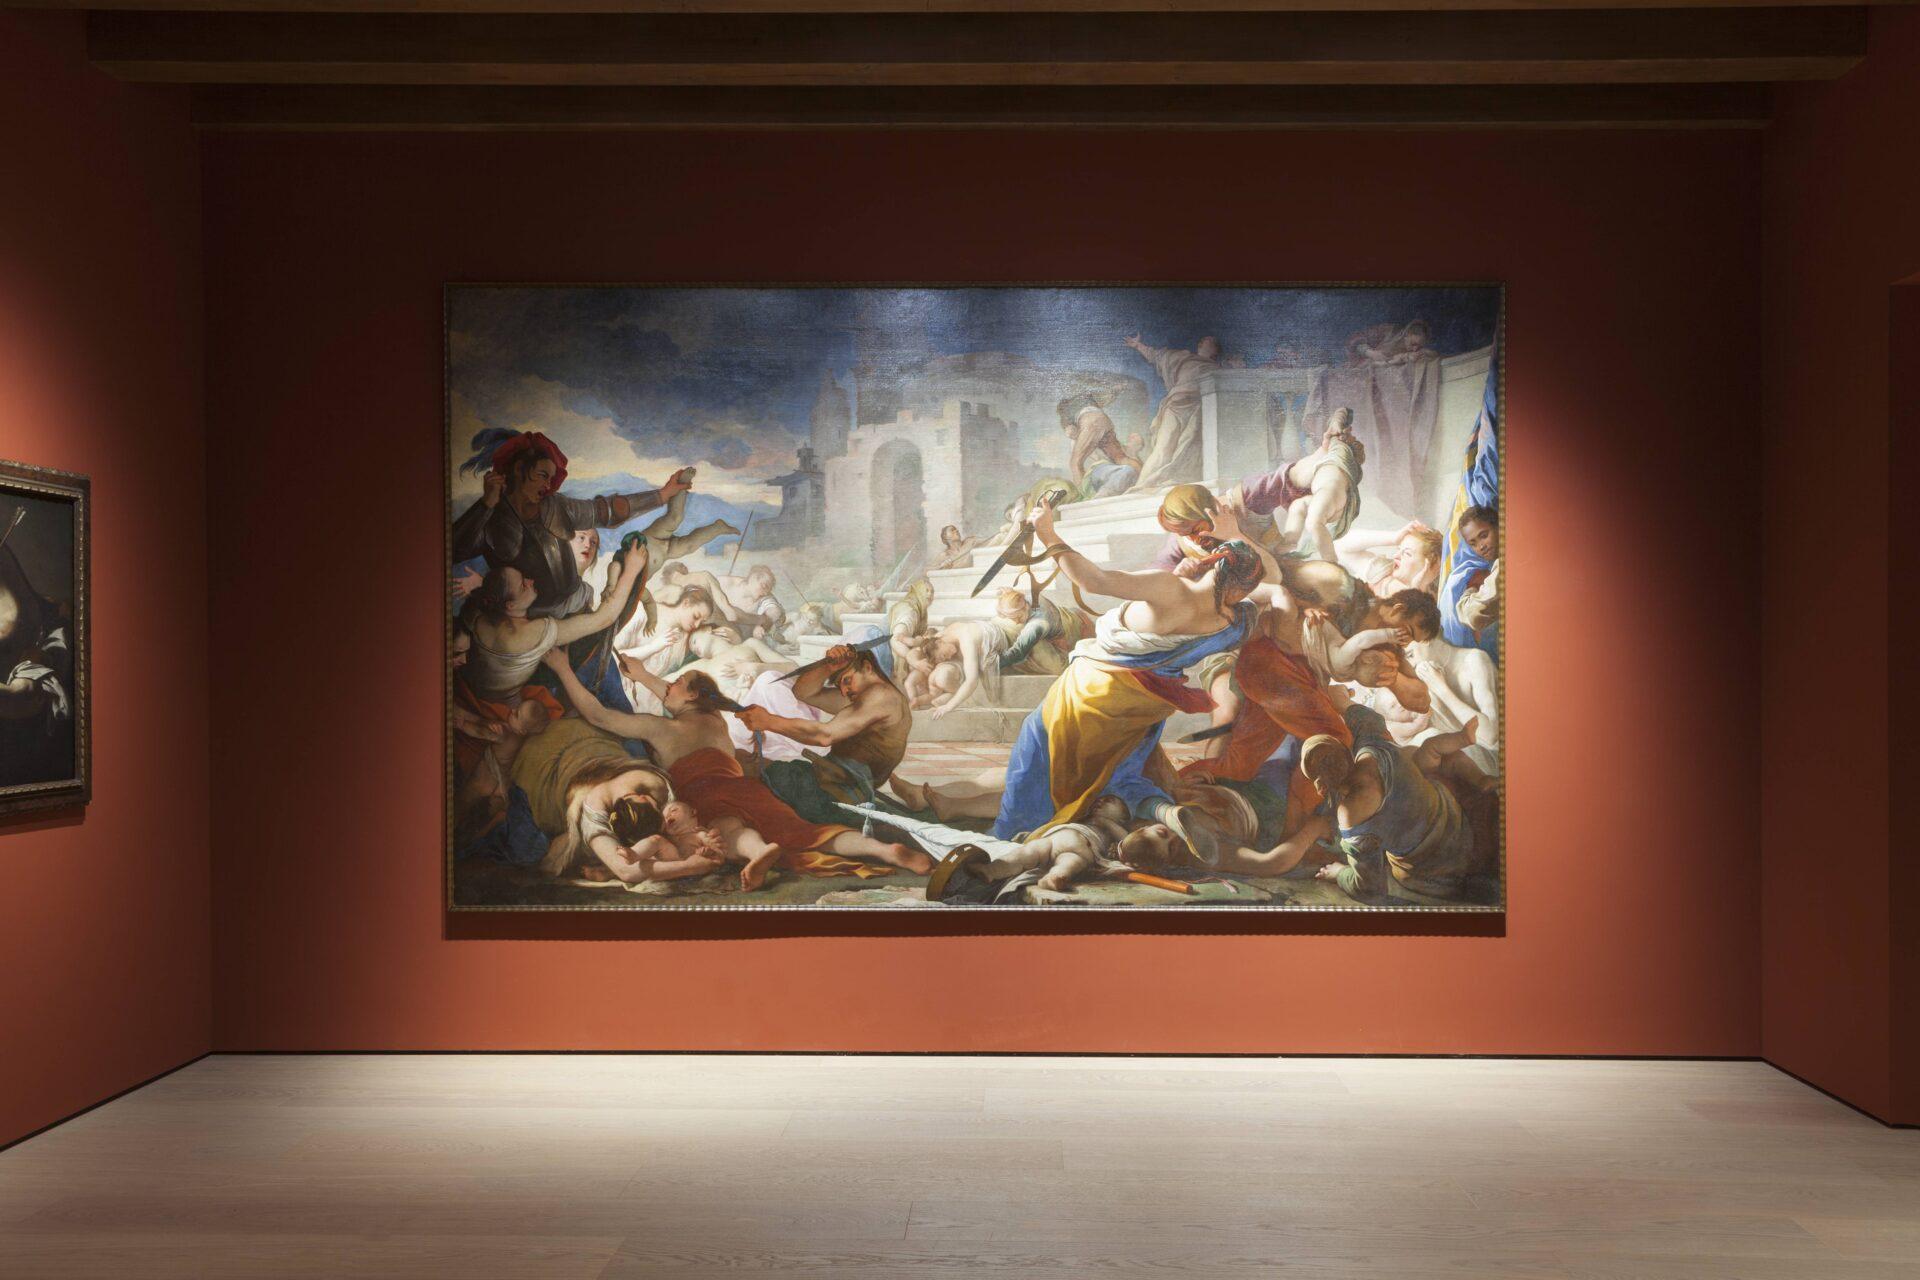 In the center, Simone Brentana, Massacre of the Innocents.